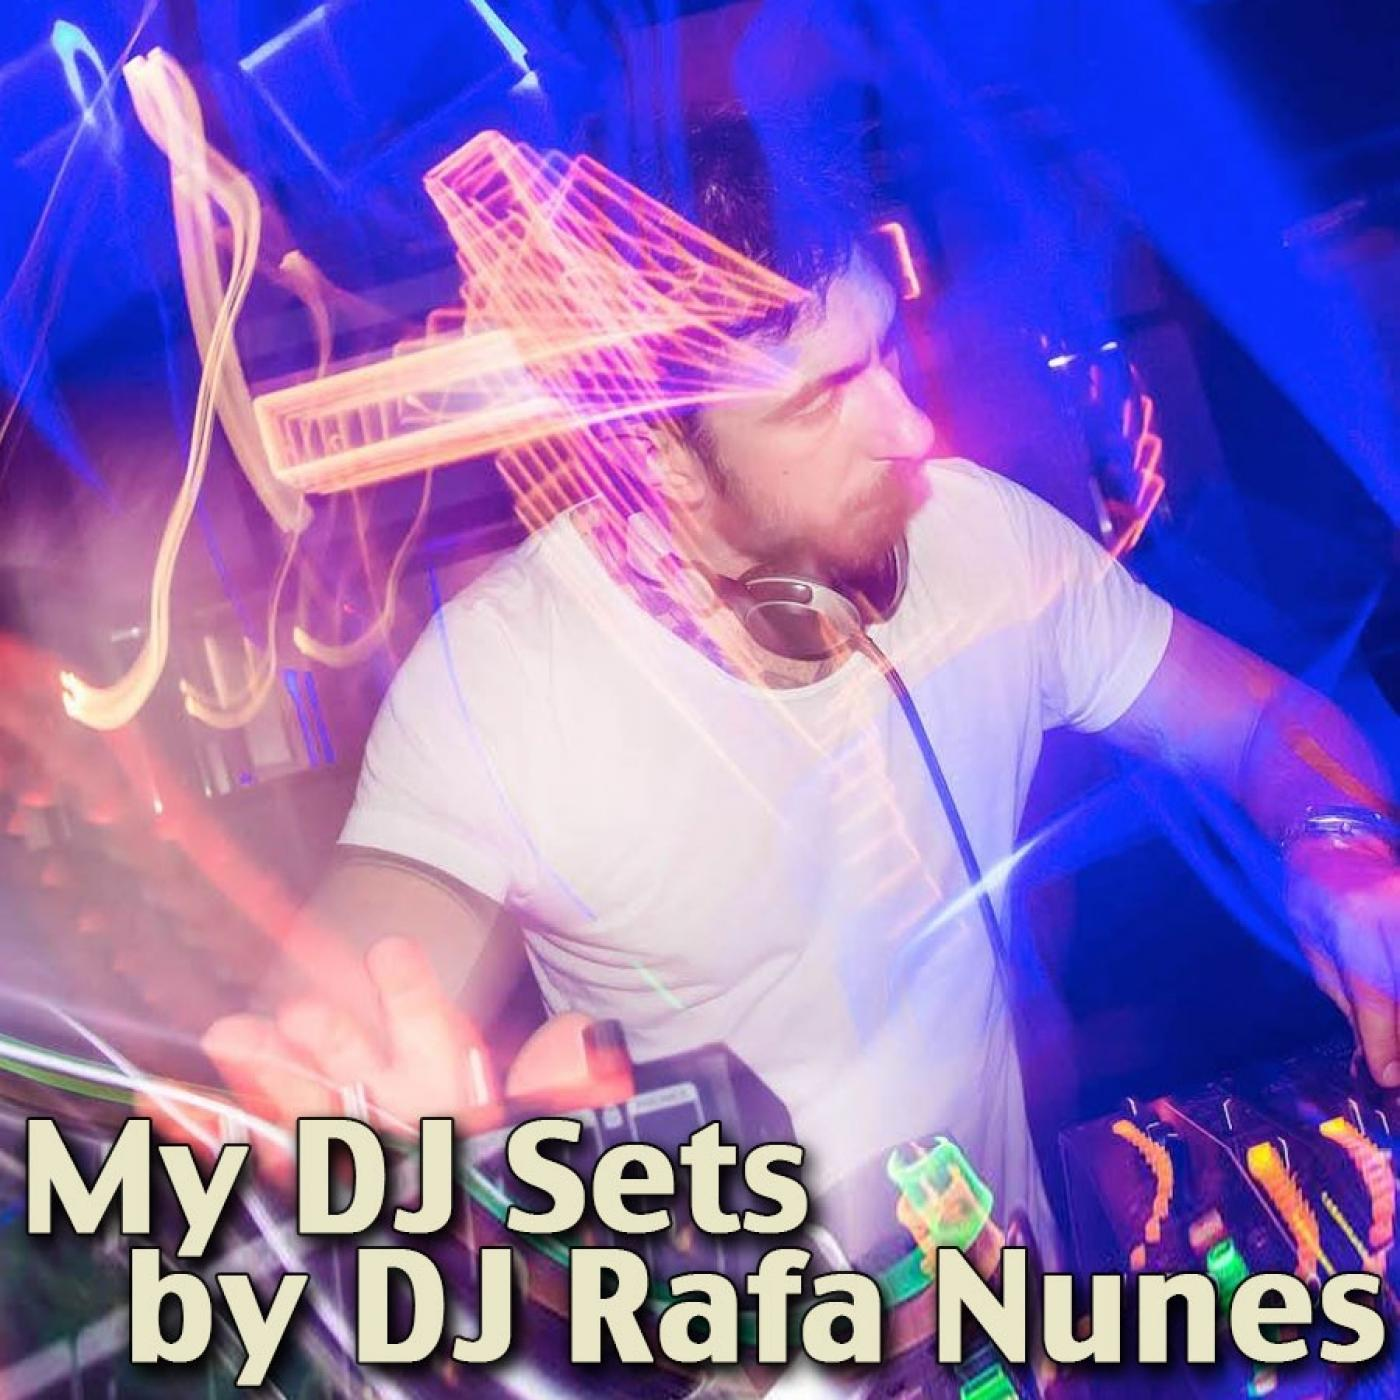 My DJ Sets by DJ Rafa Nunes